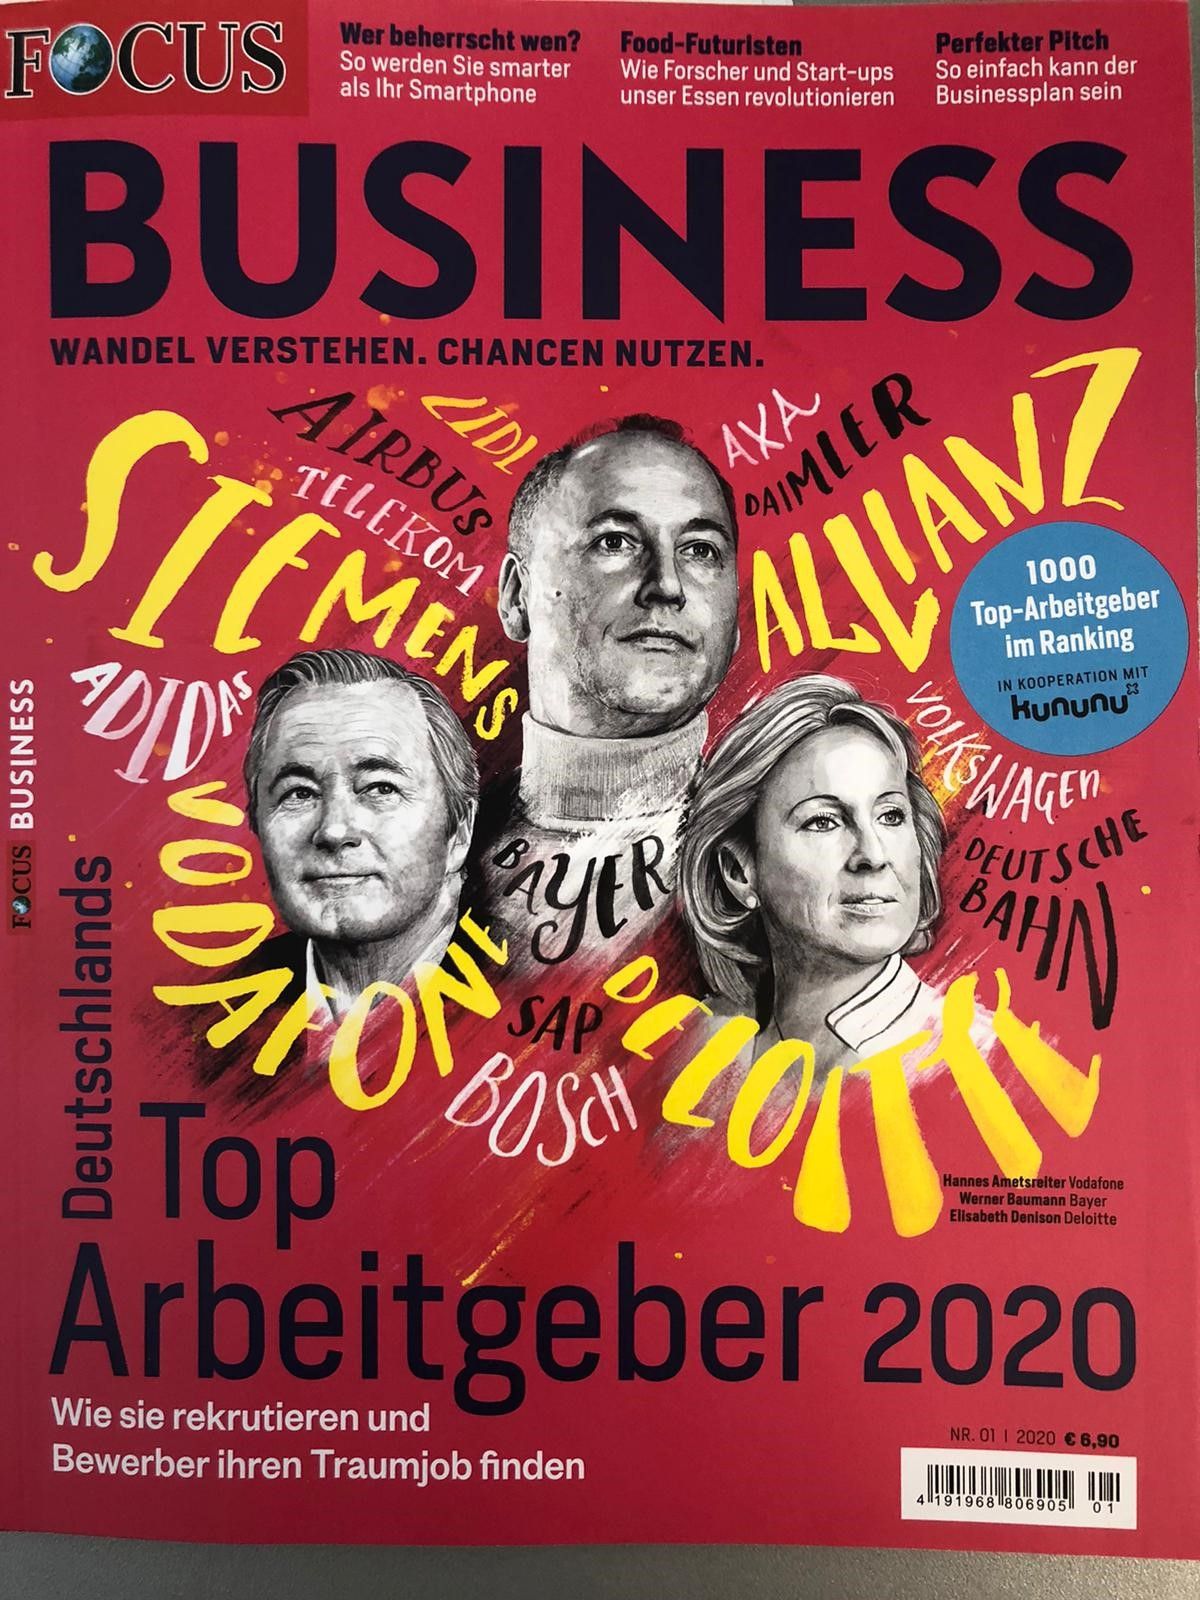 Focus Business zeichnet Select als Top-Arbeitgeber aus